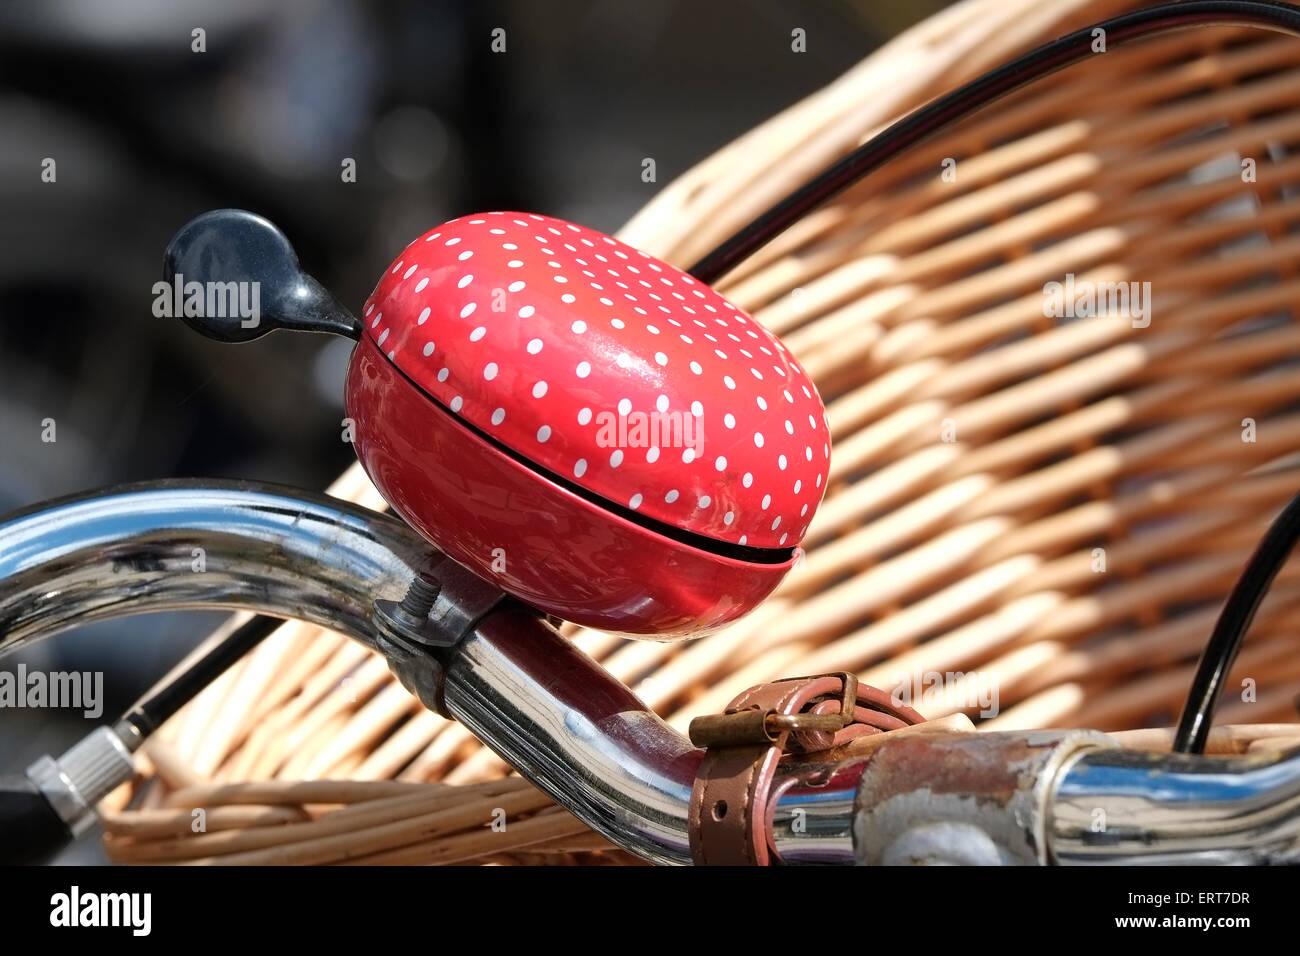 red bell on cycle handlebars, cambridge, england - Stock Image